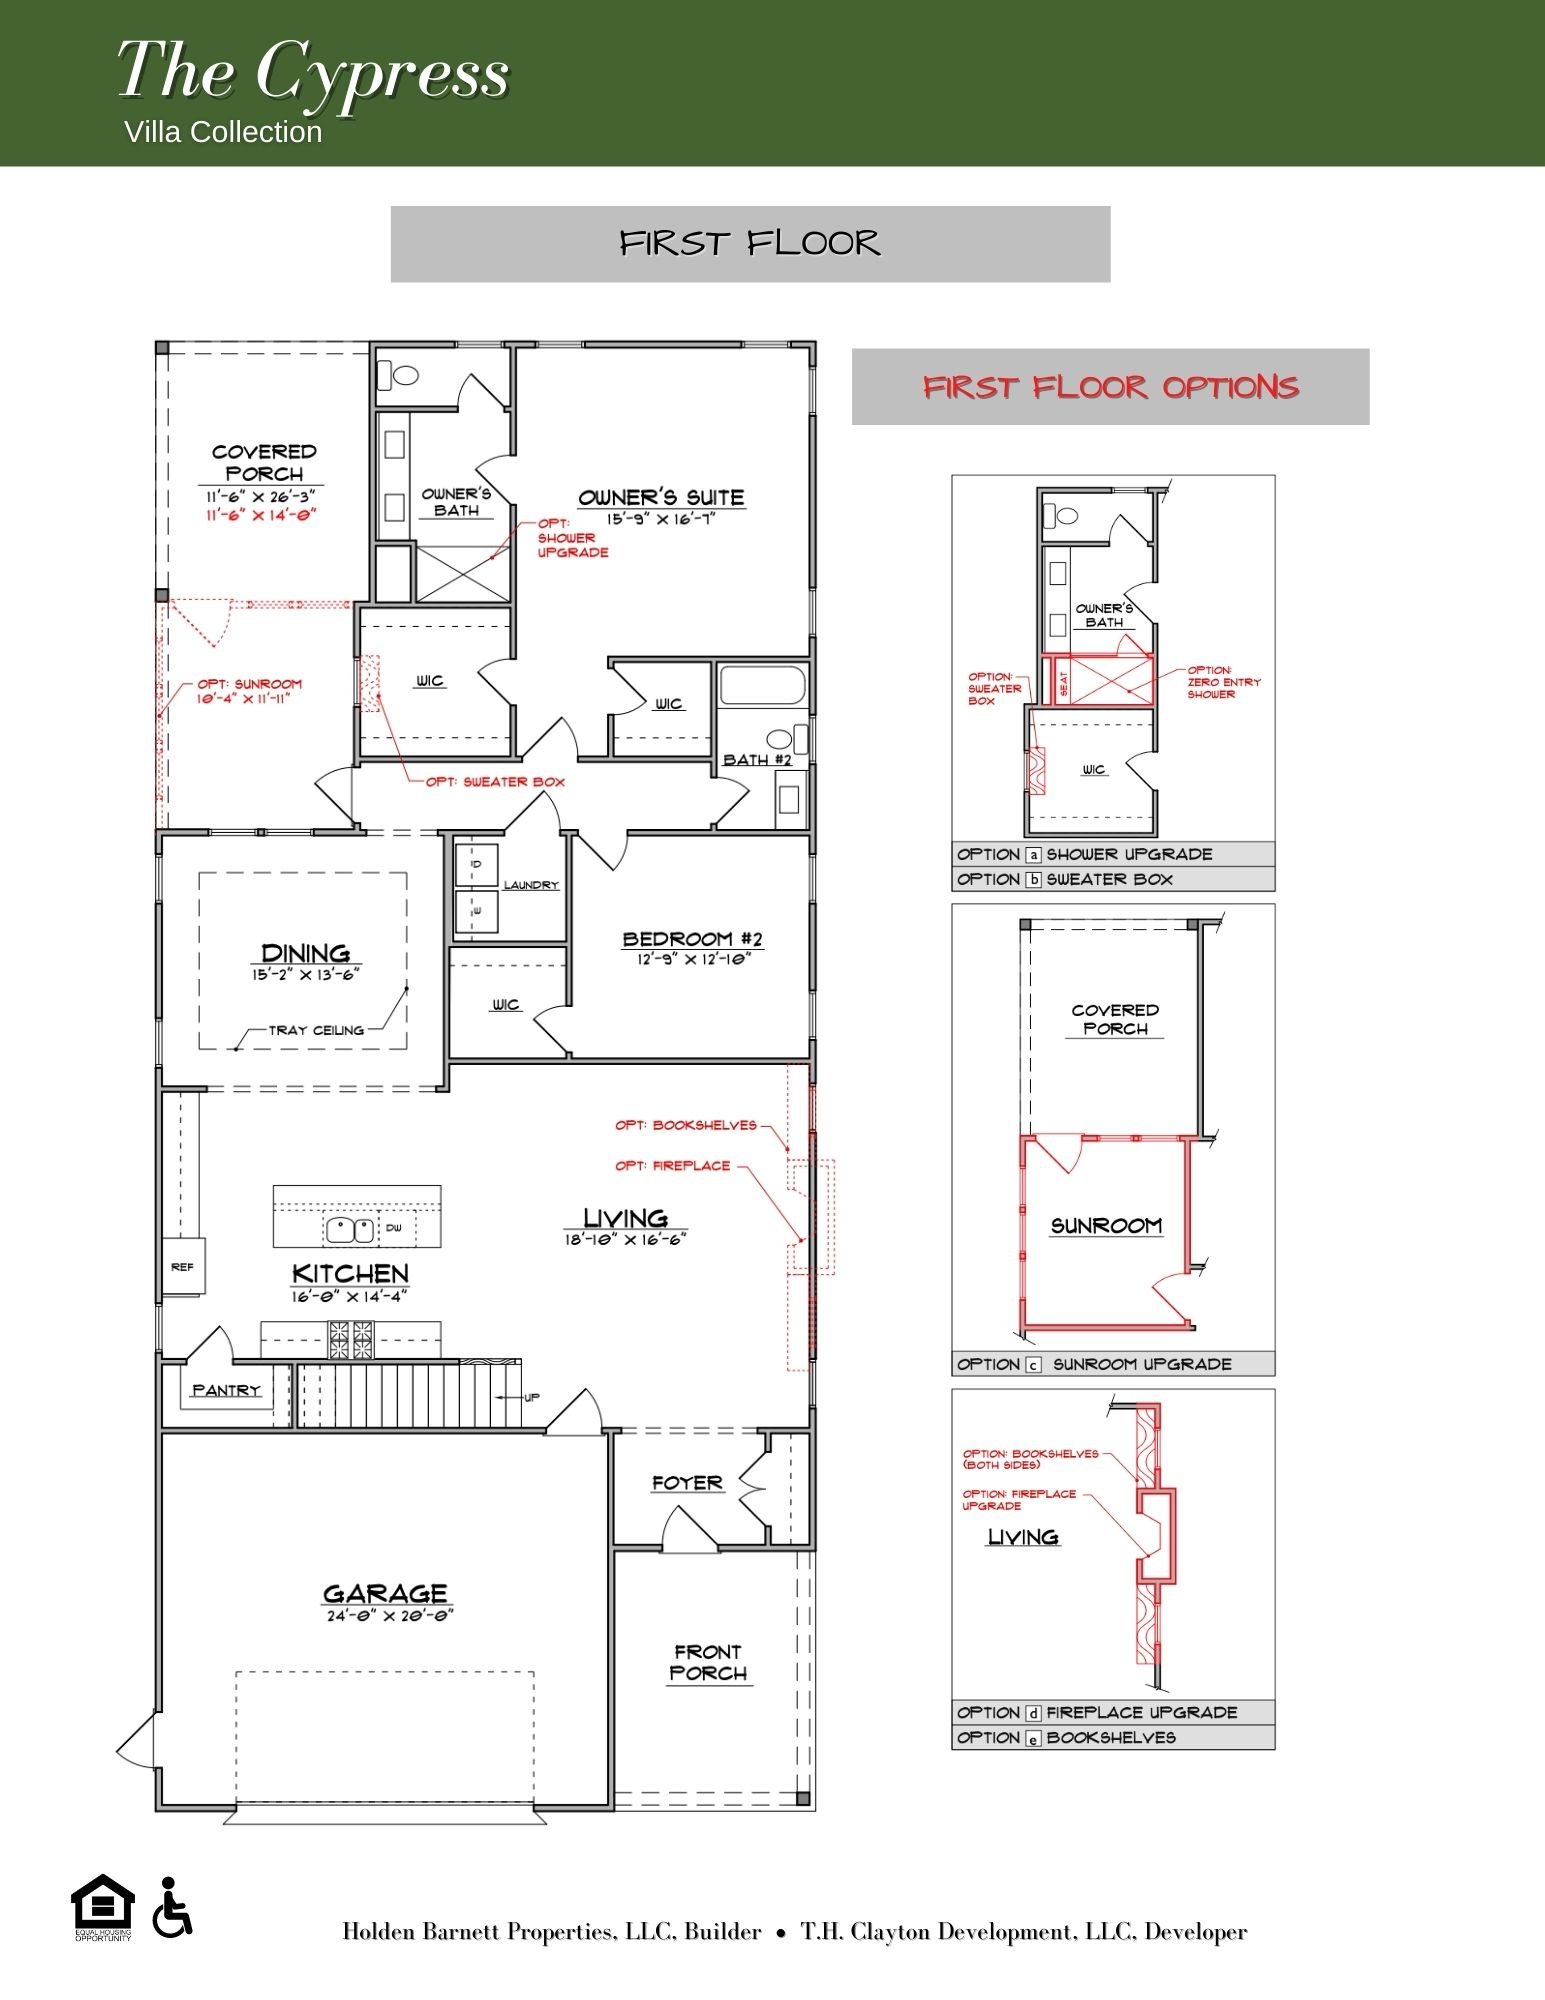 The Cypress First Floor Floorplan